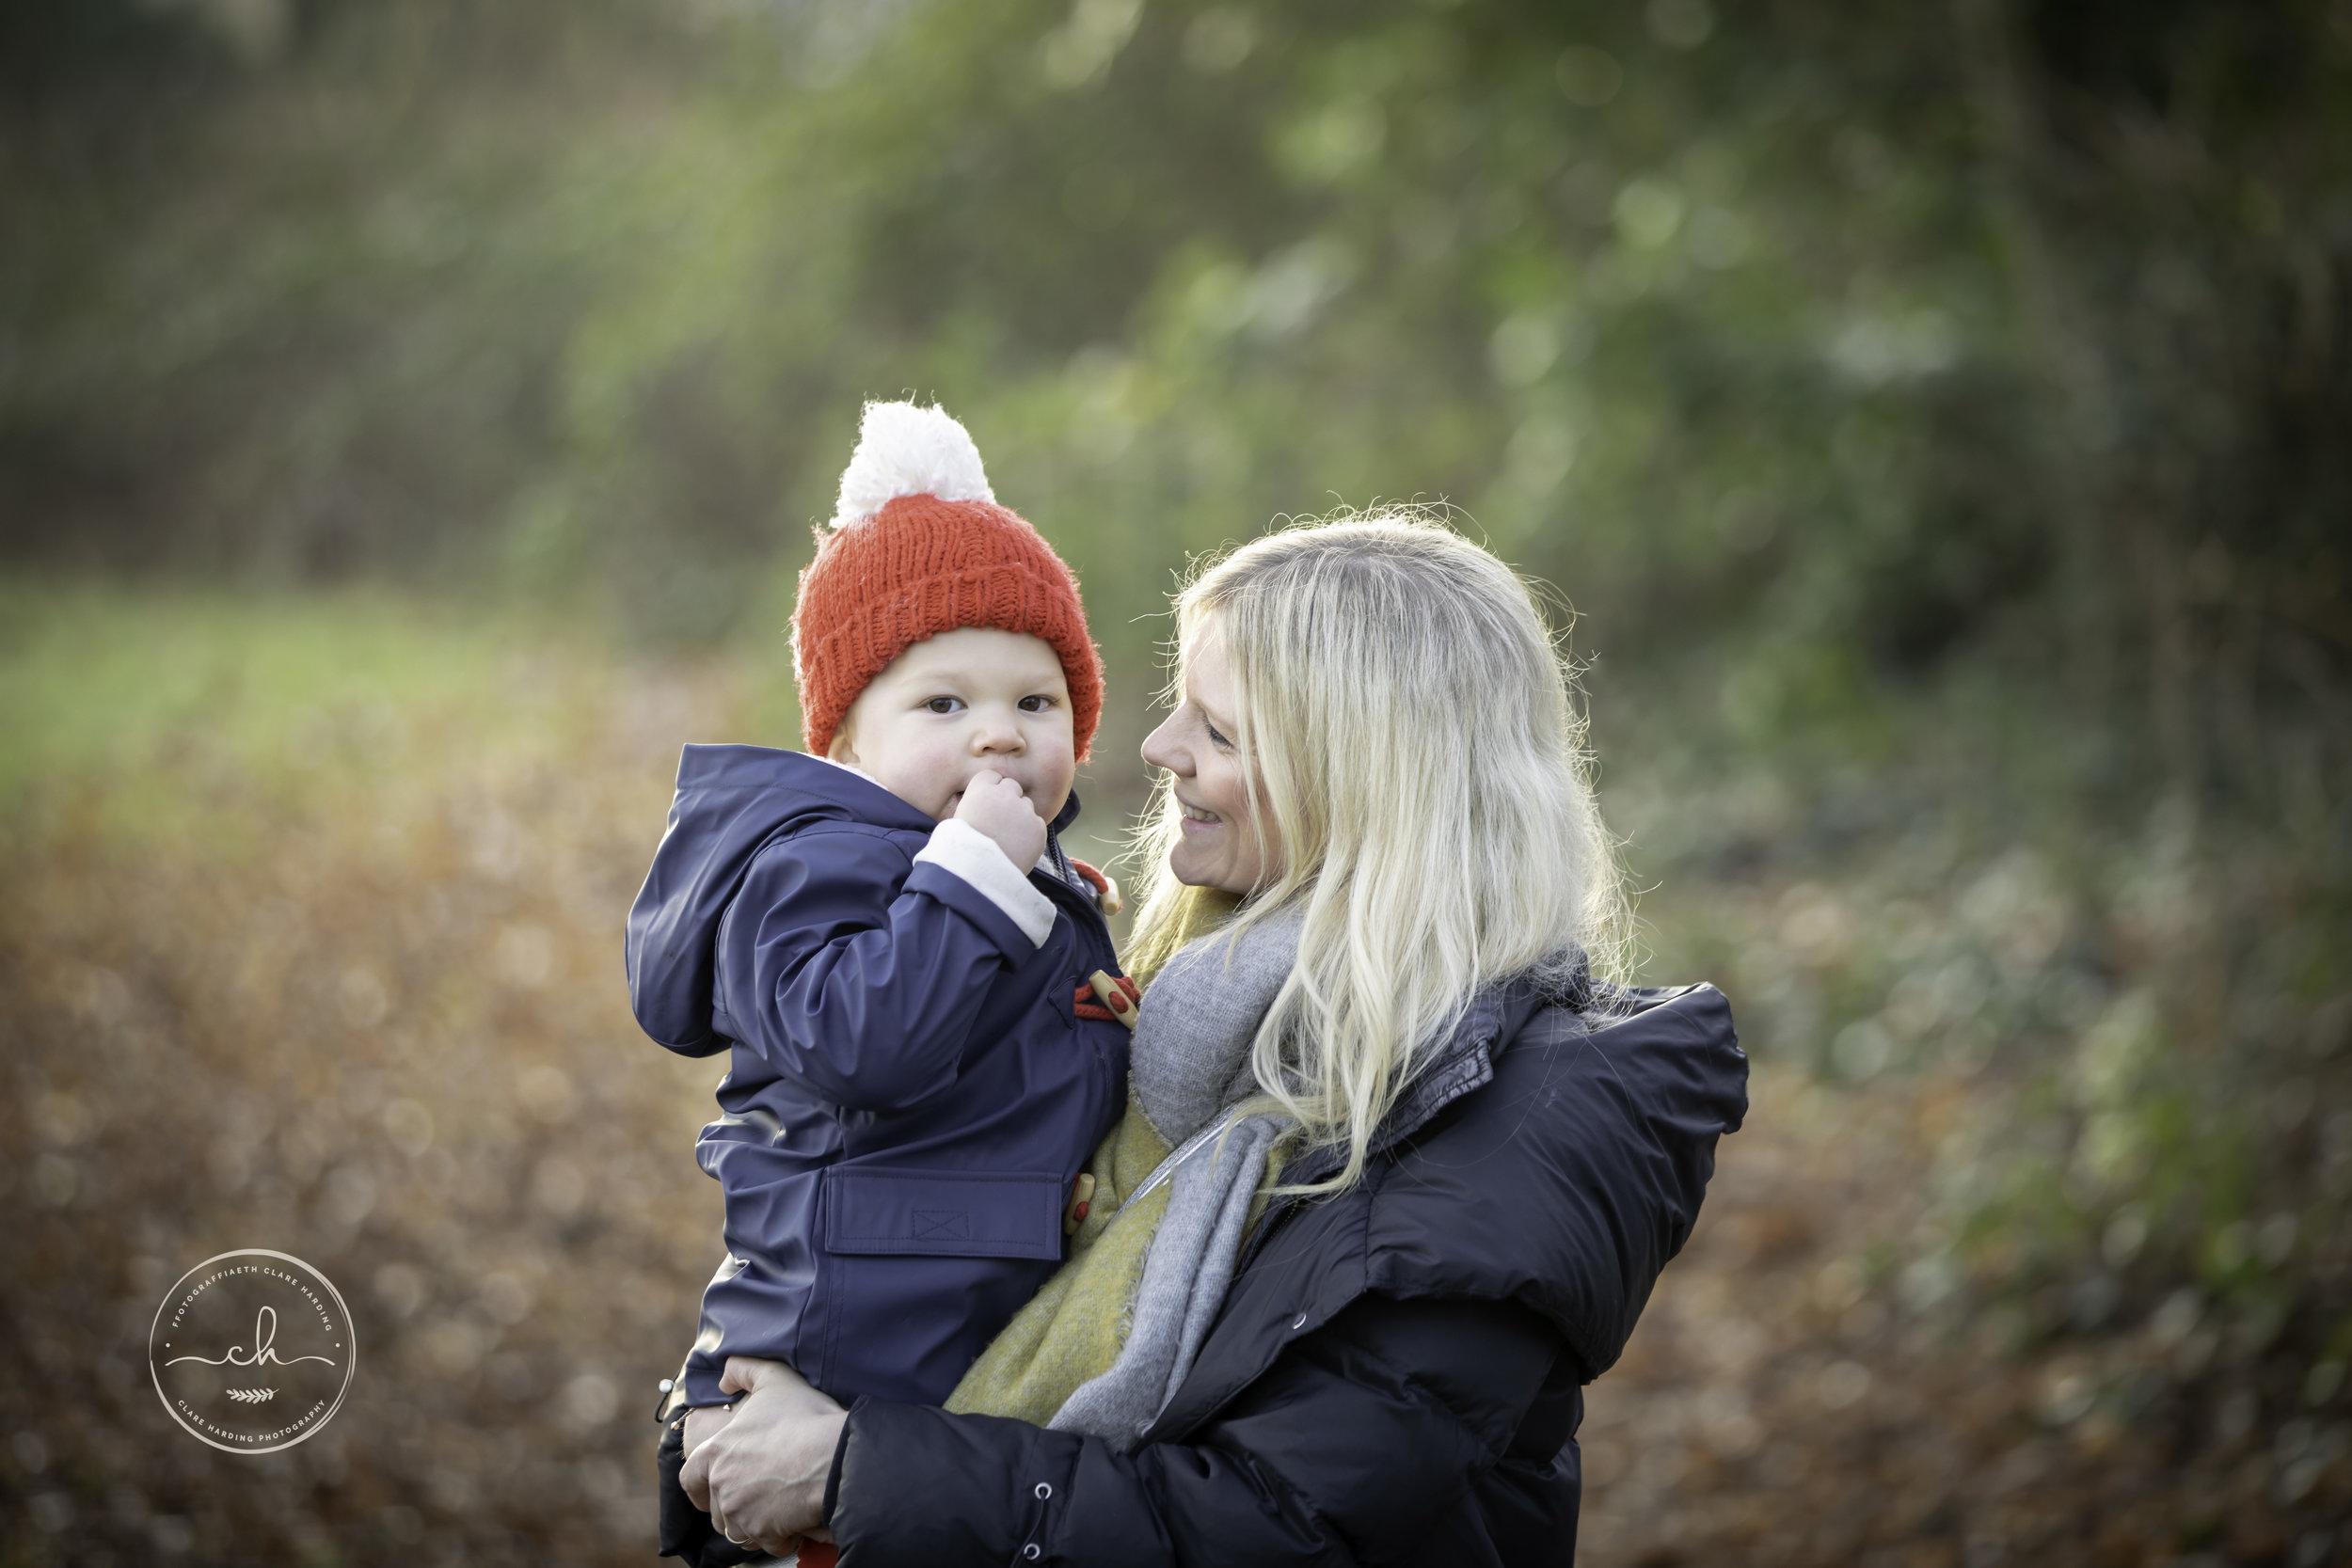 child-family-photography-vale-of-glamorgan.jpg